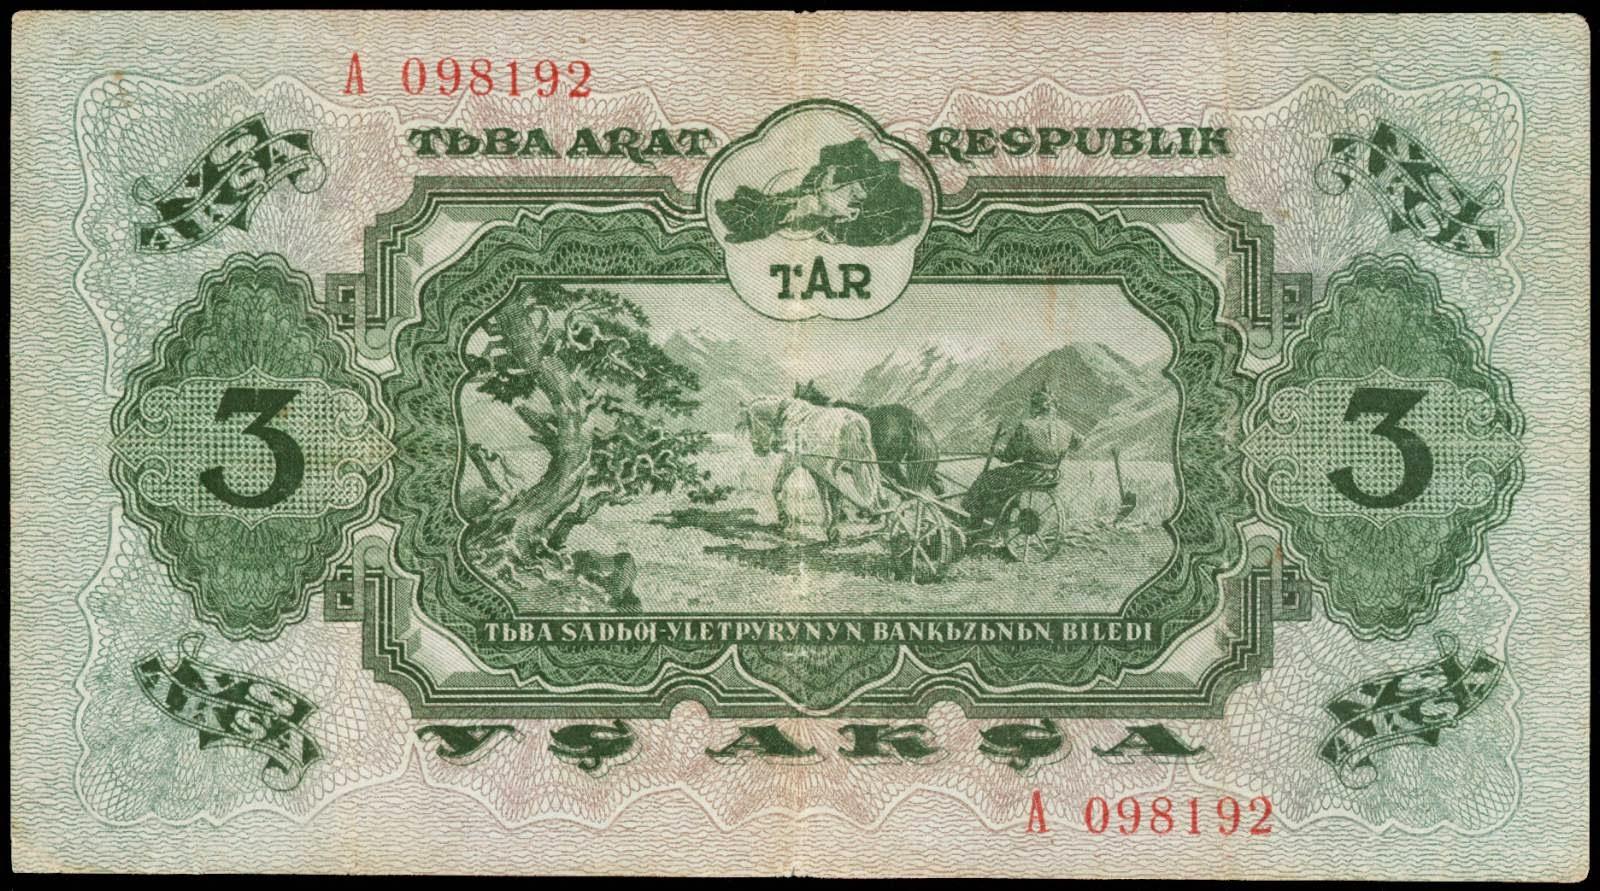 Tanna Tuva banknotes 3 Aksha note 1940